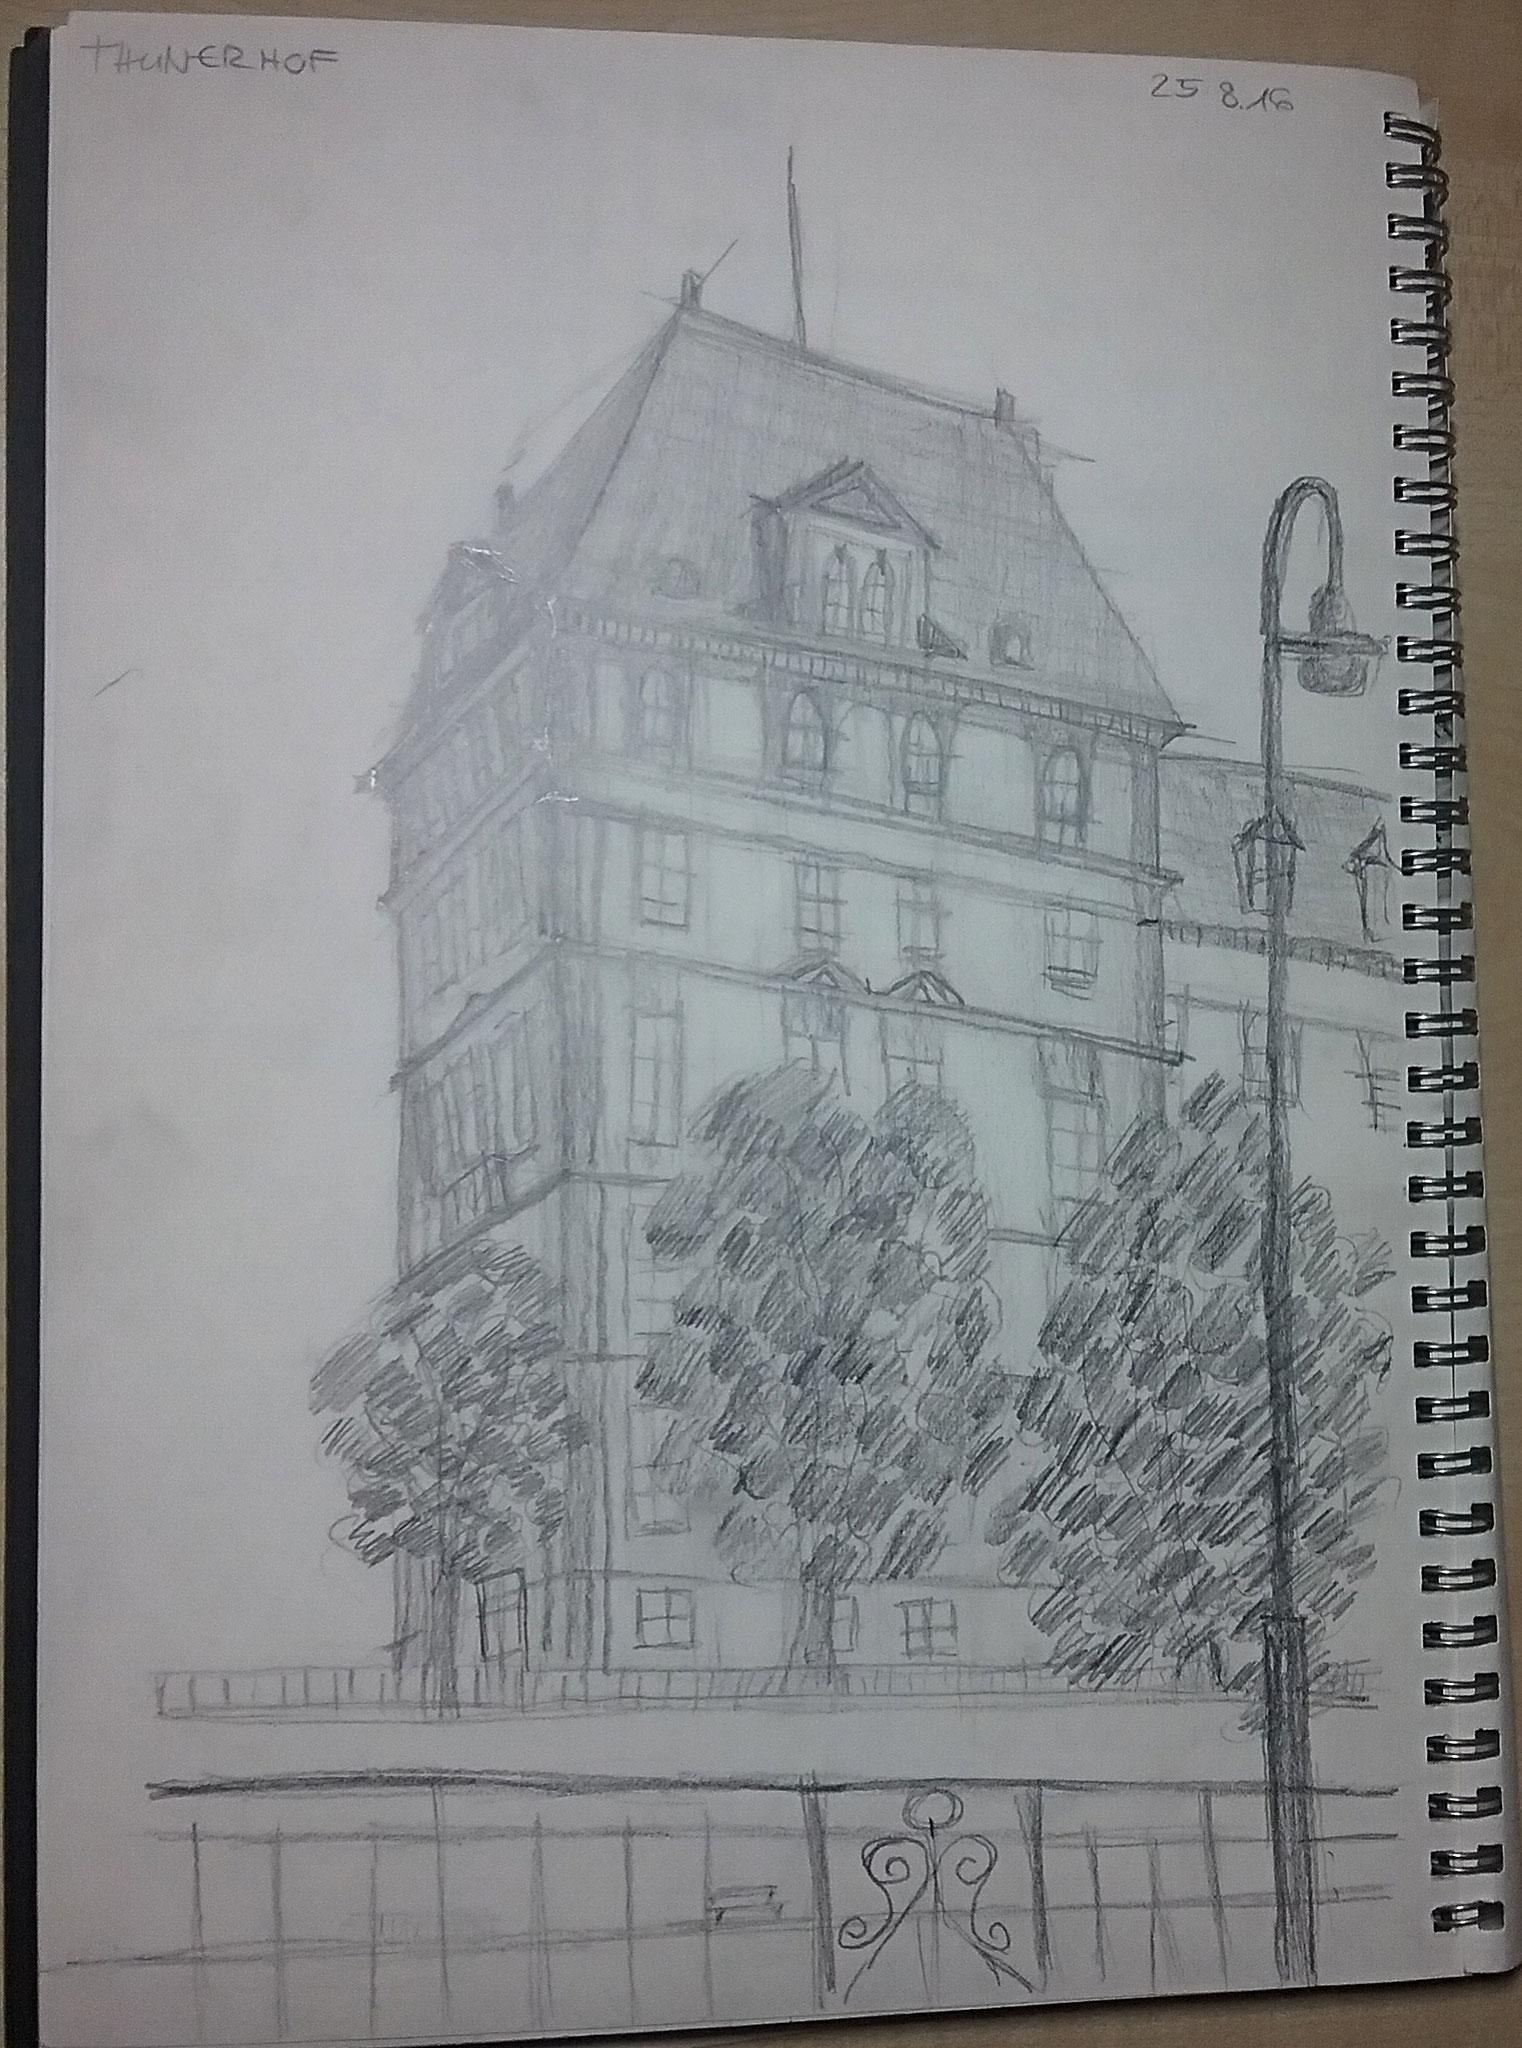 Thunerhof